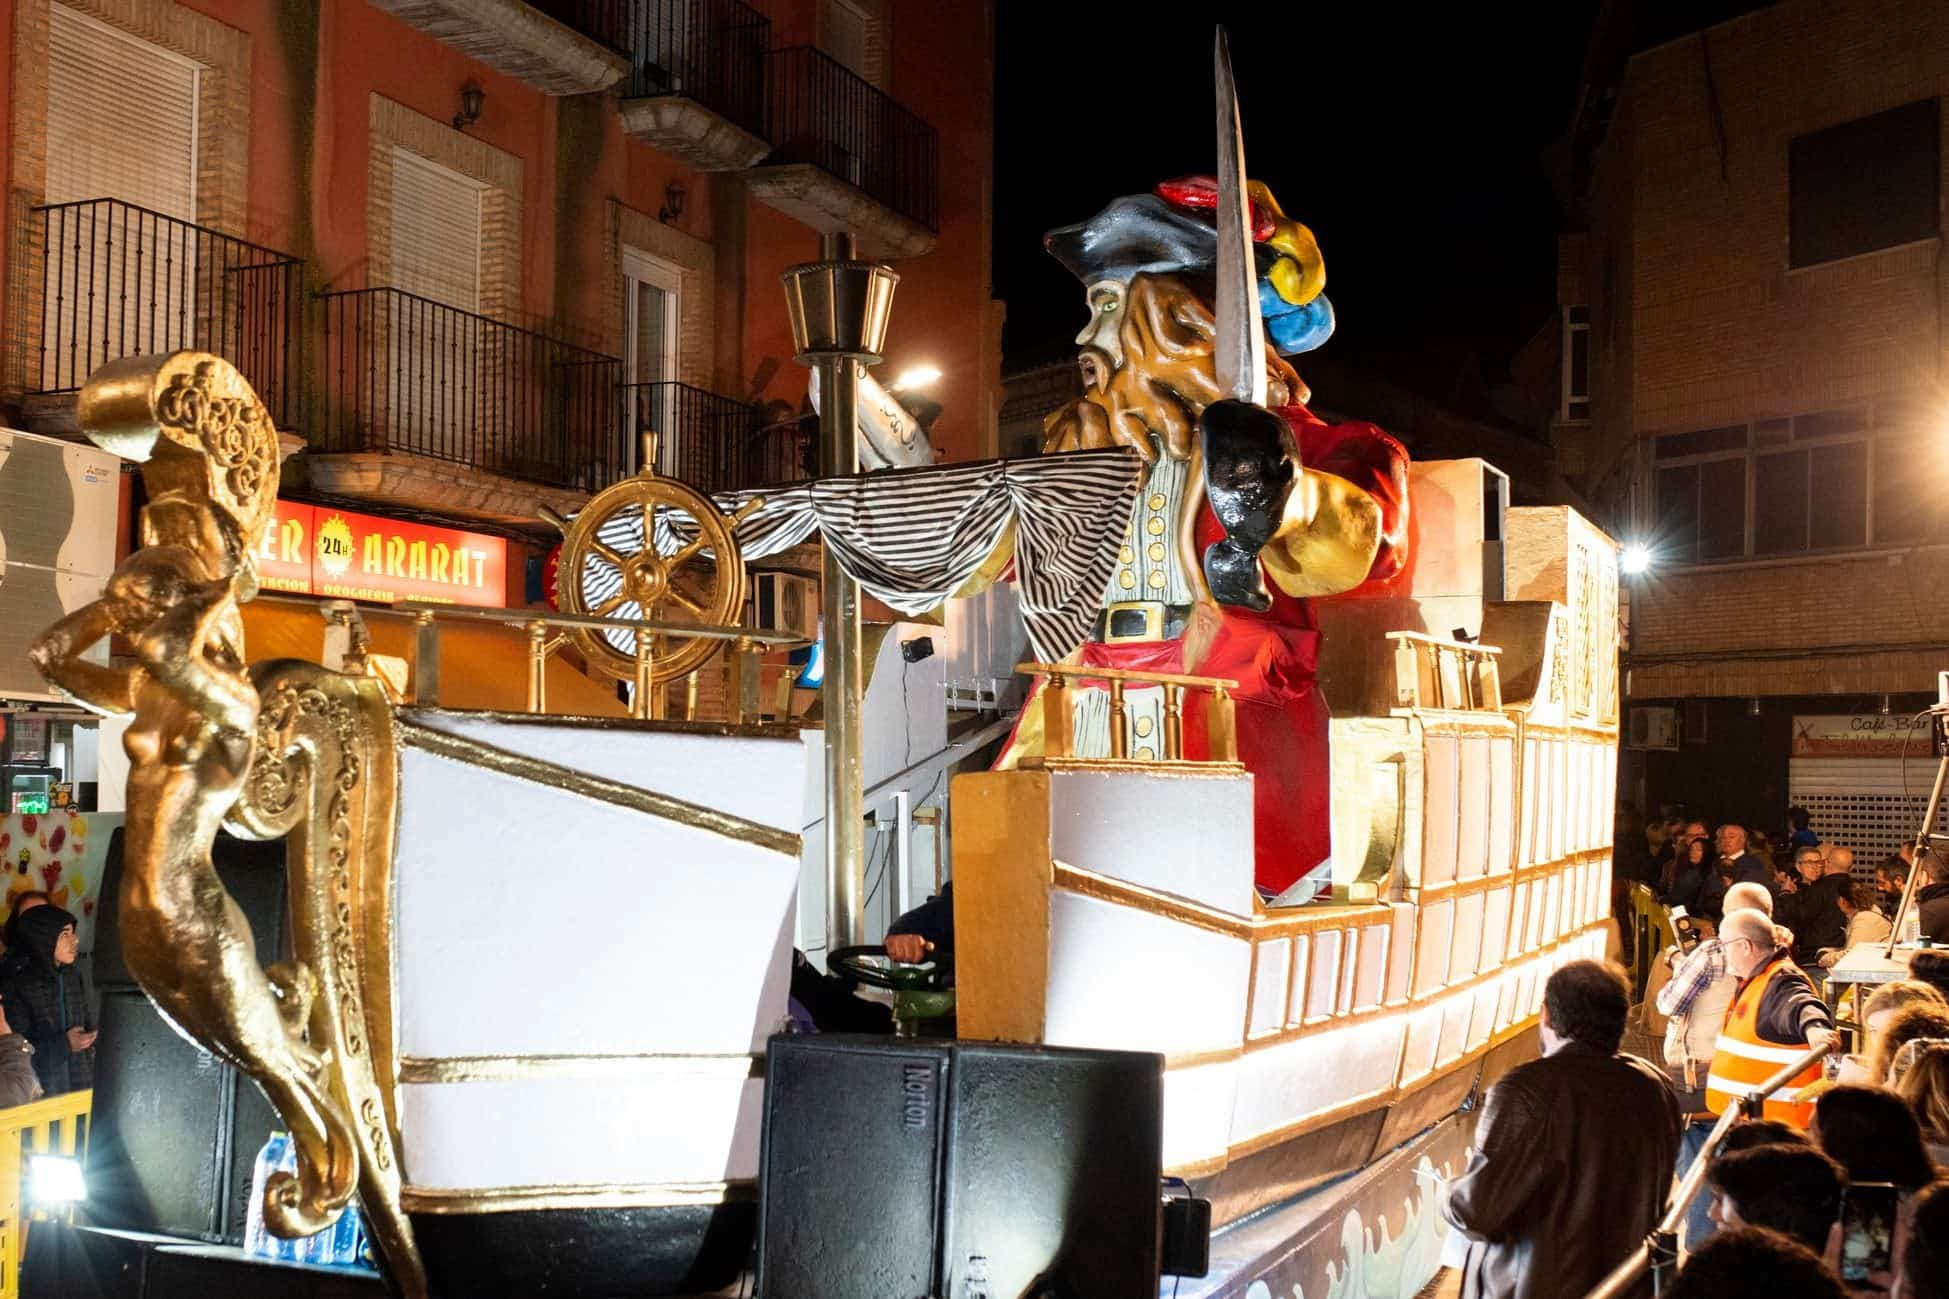 Carnaval de herencia 2020 ofertorio 125 - Selección de fotografías del Ofertorio del Carnaval de Herencia